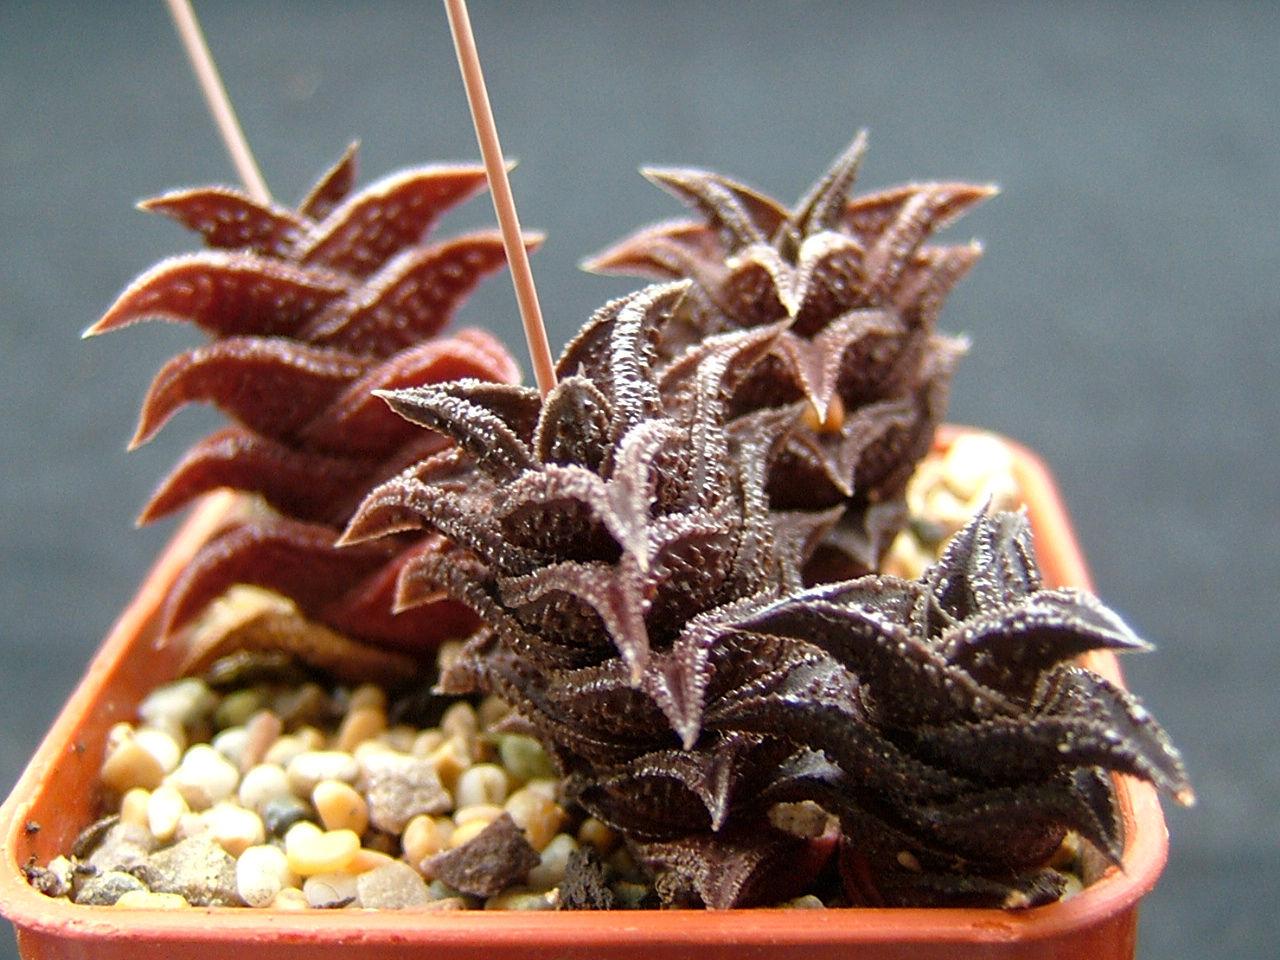 Haworthia nigra(schmidtiana) SPT793 ex P.Bent 2002